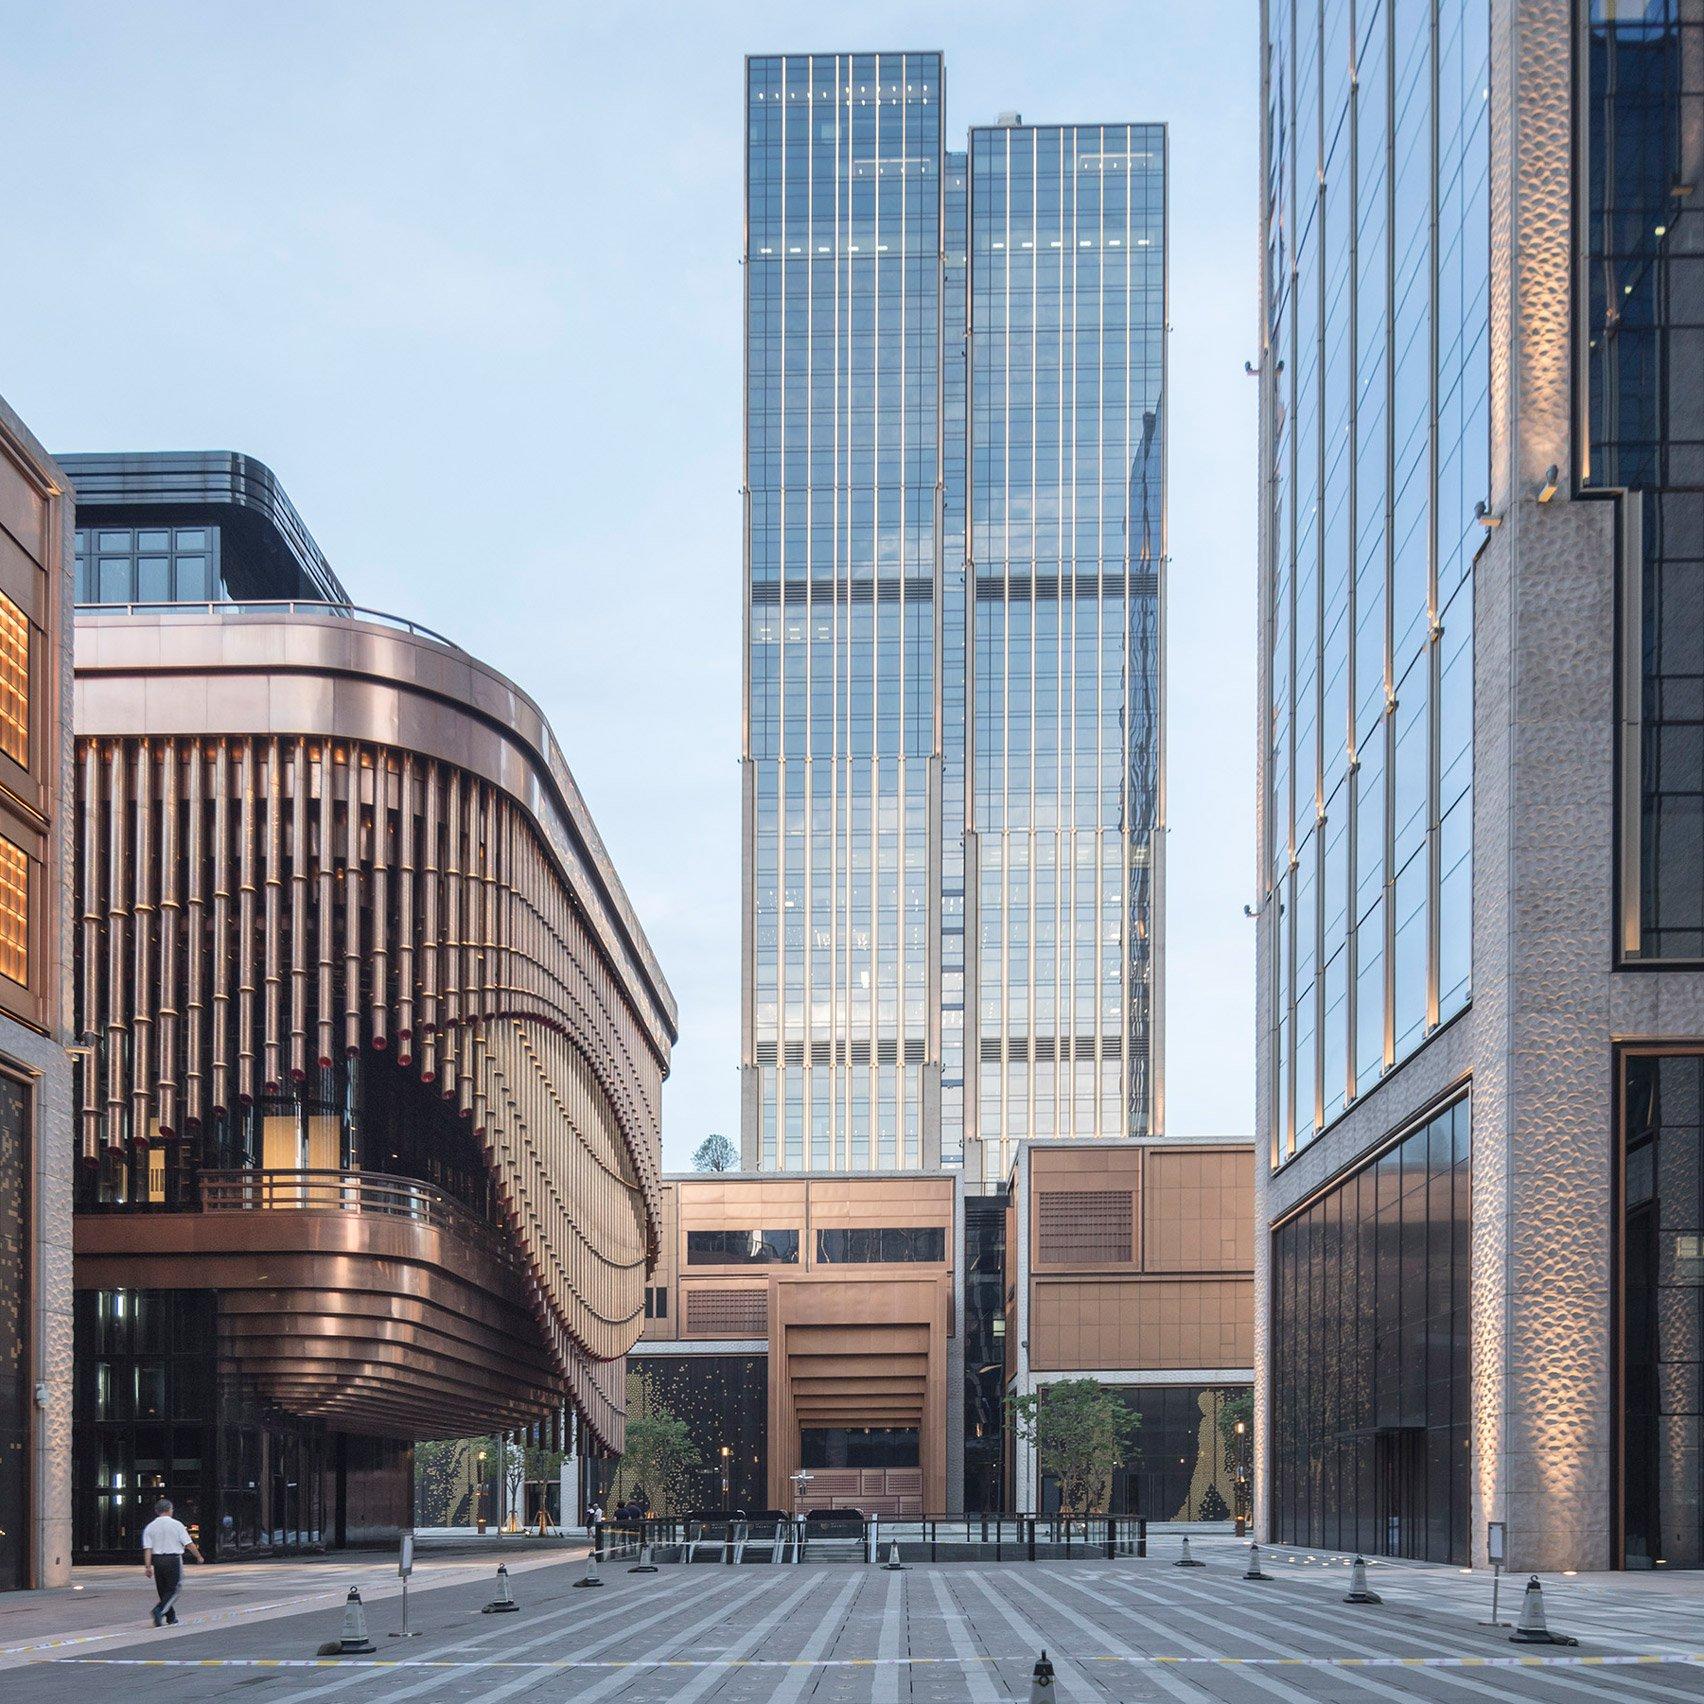 bund-finance-centre-foster-partners-heatherwick-architecture-skyscrapers-china-shanghai-_dezeen_sq-1.jpg